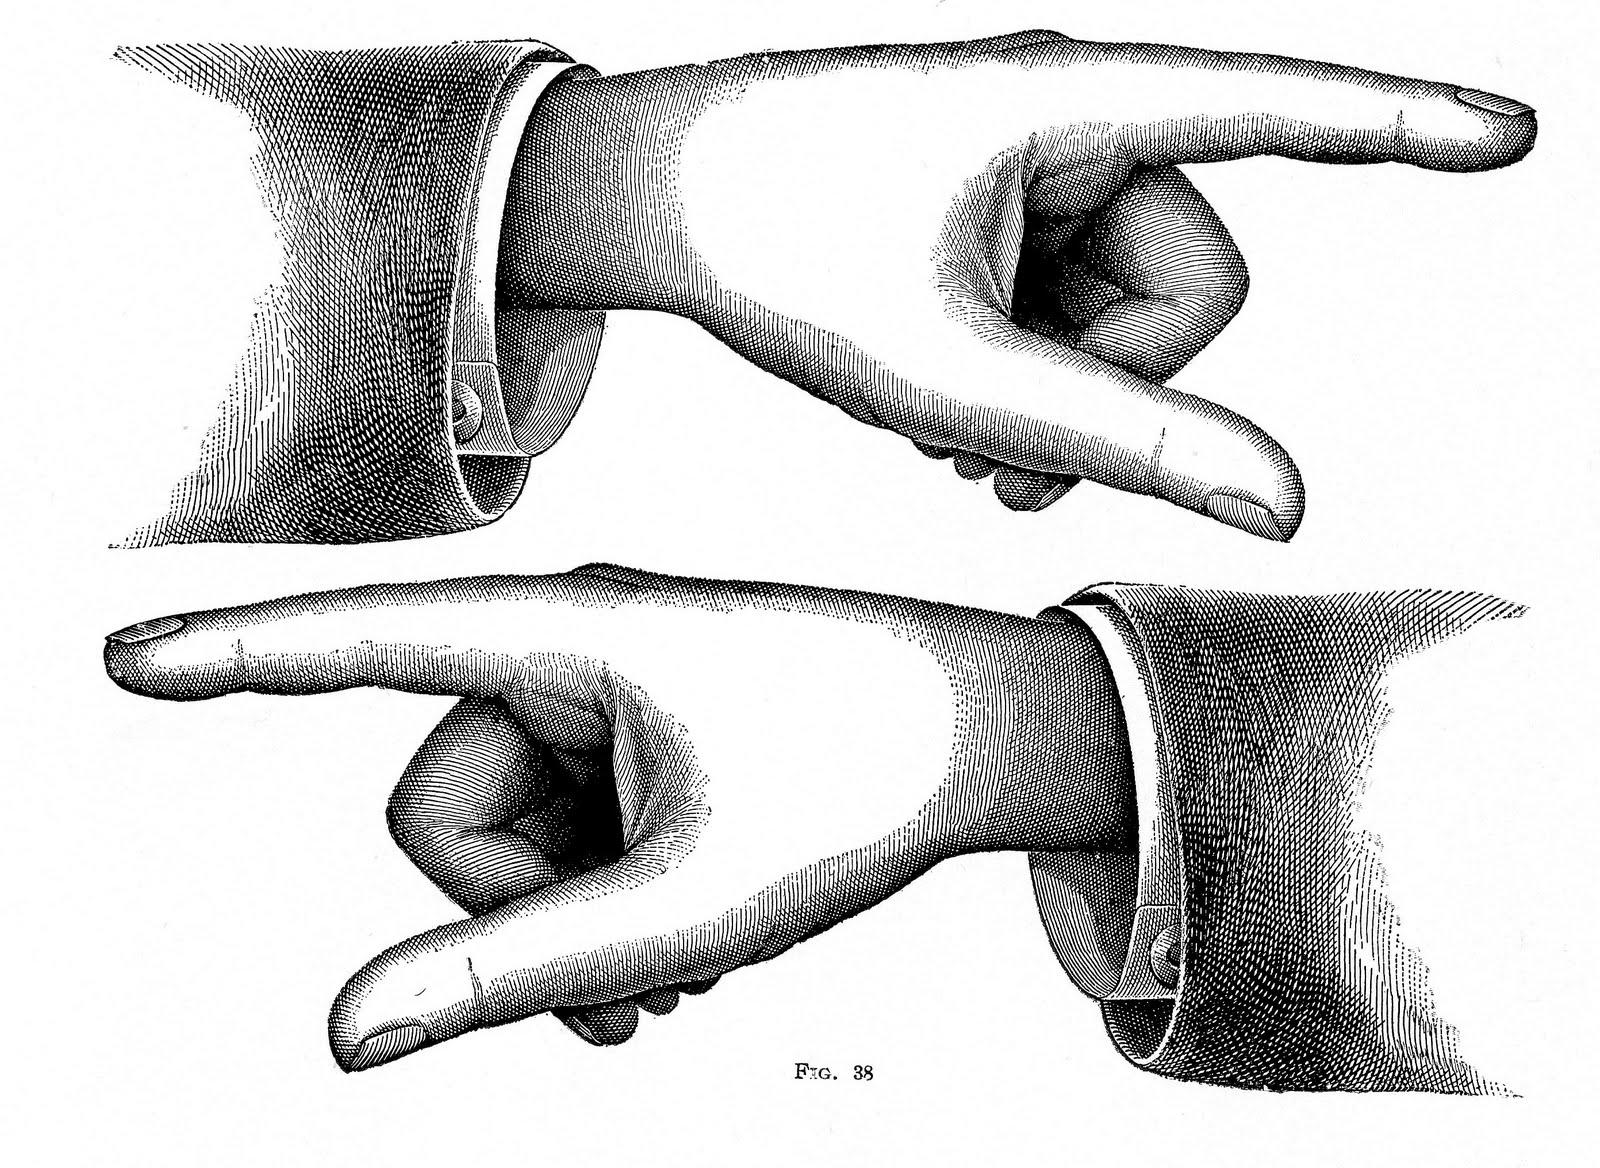 Steampunk Clip Art Images